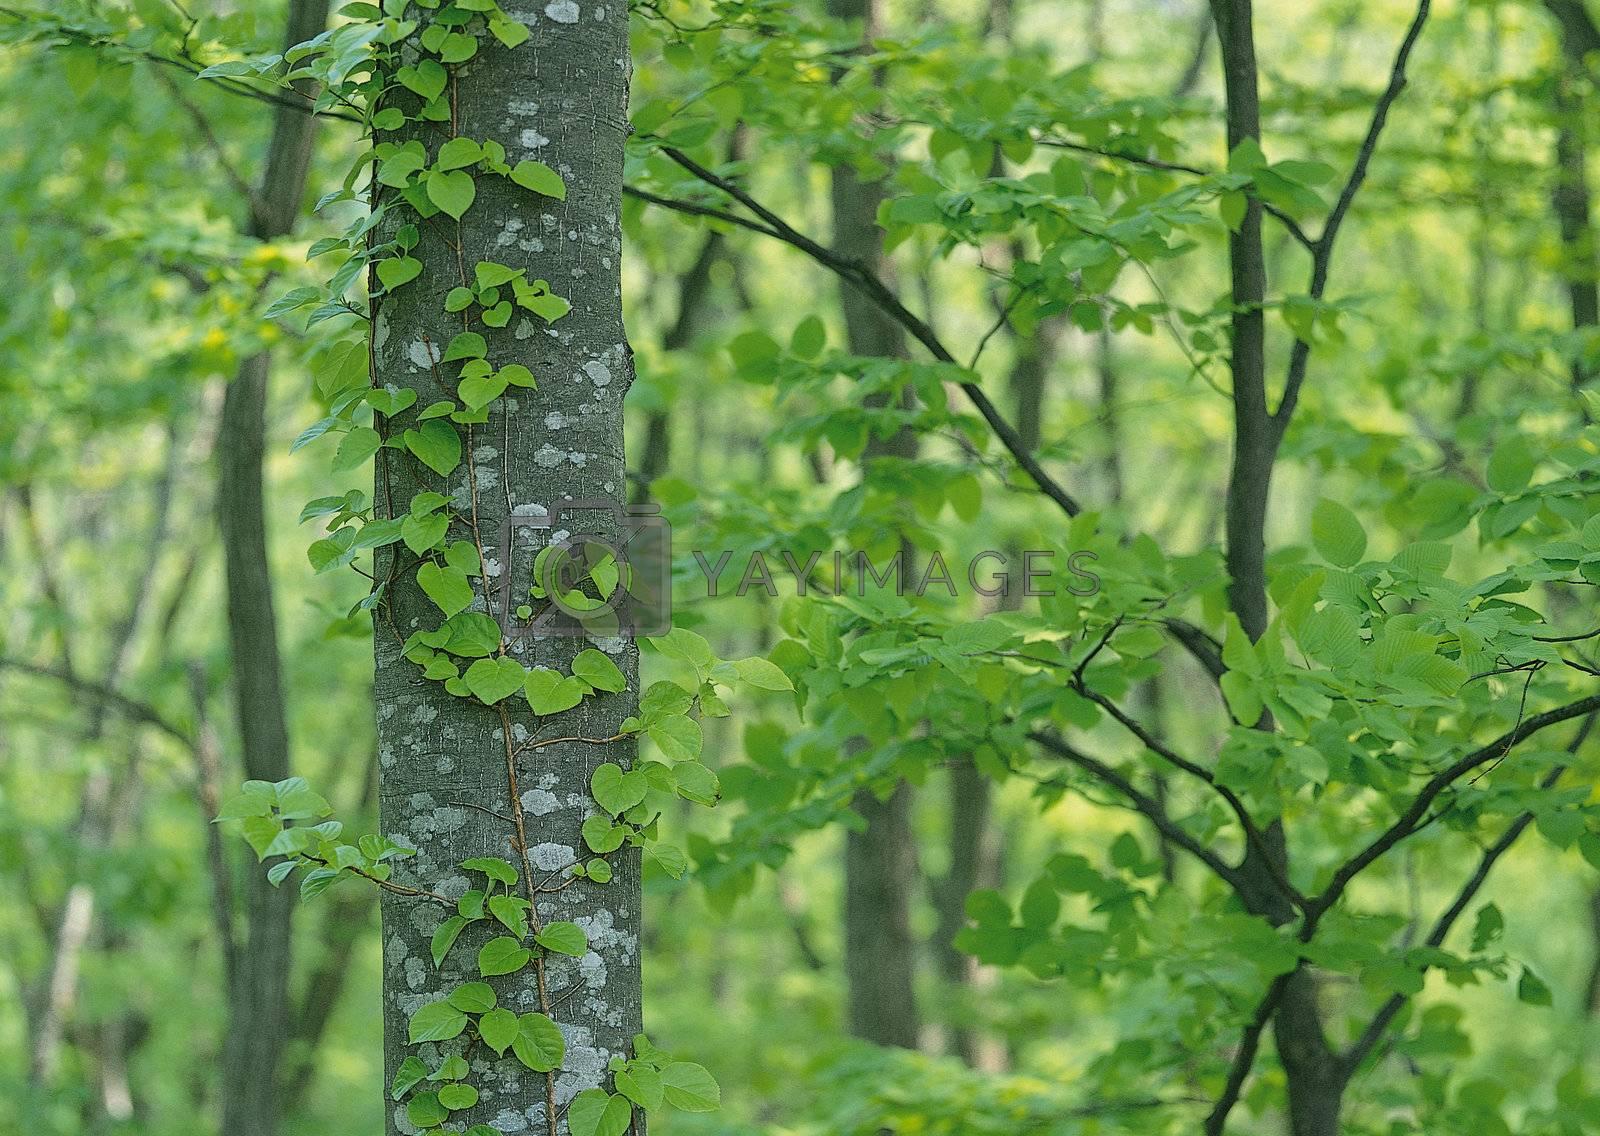 Landscape image - seasons nature